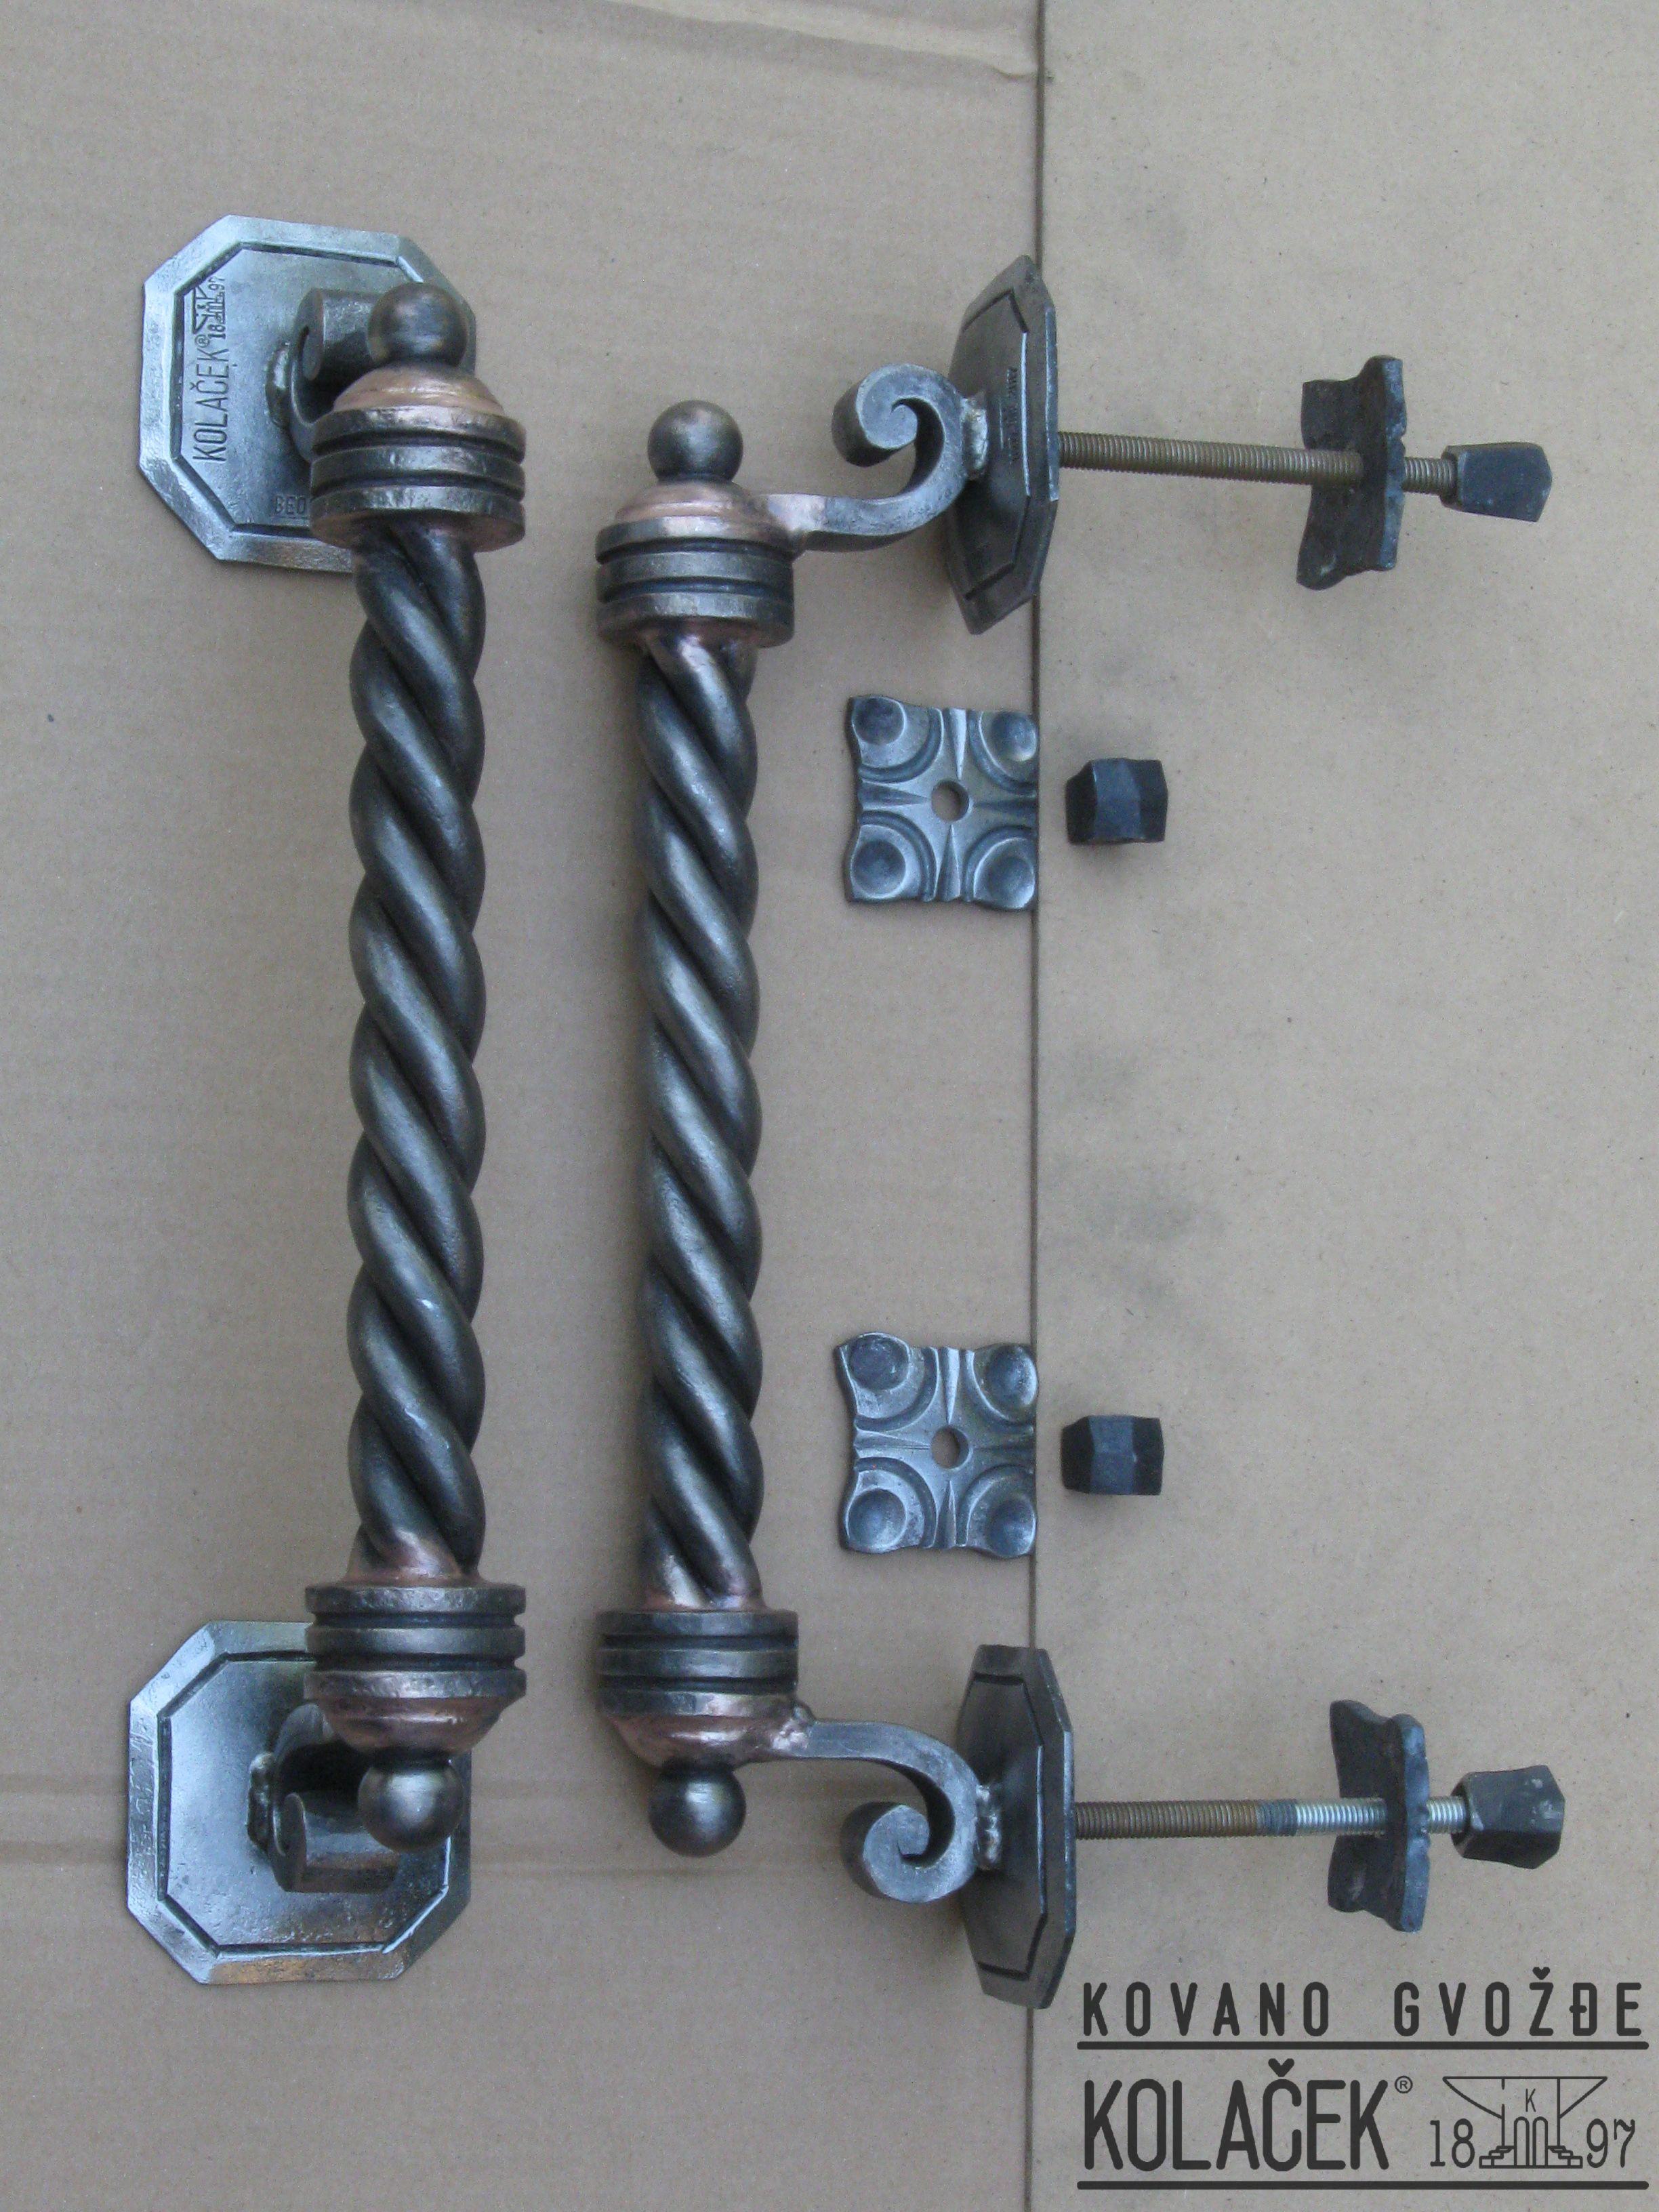 Door handle wrought iron Rucica za vrata od kovanog gvozdja